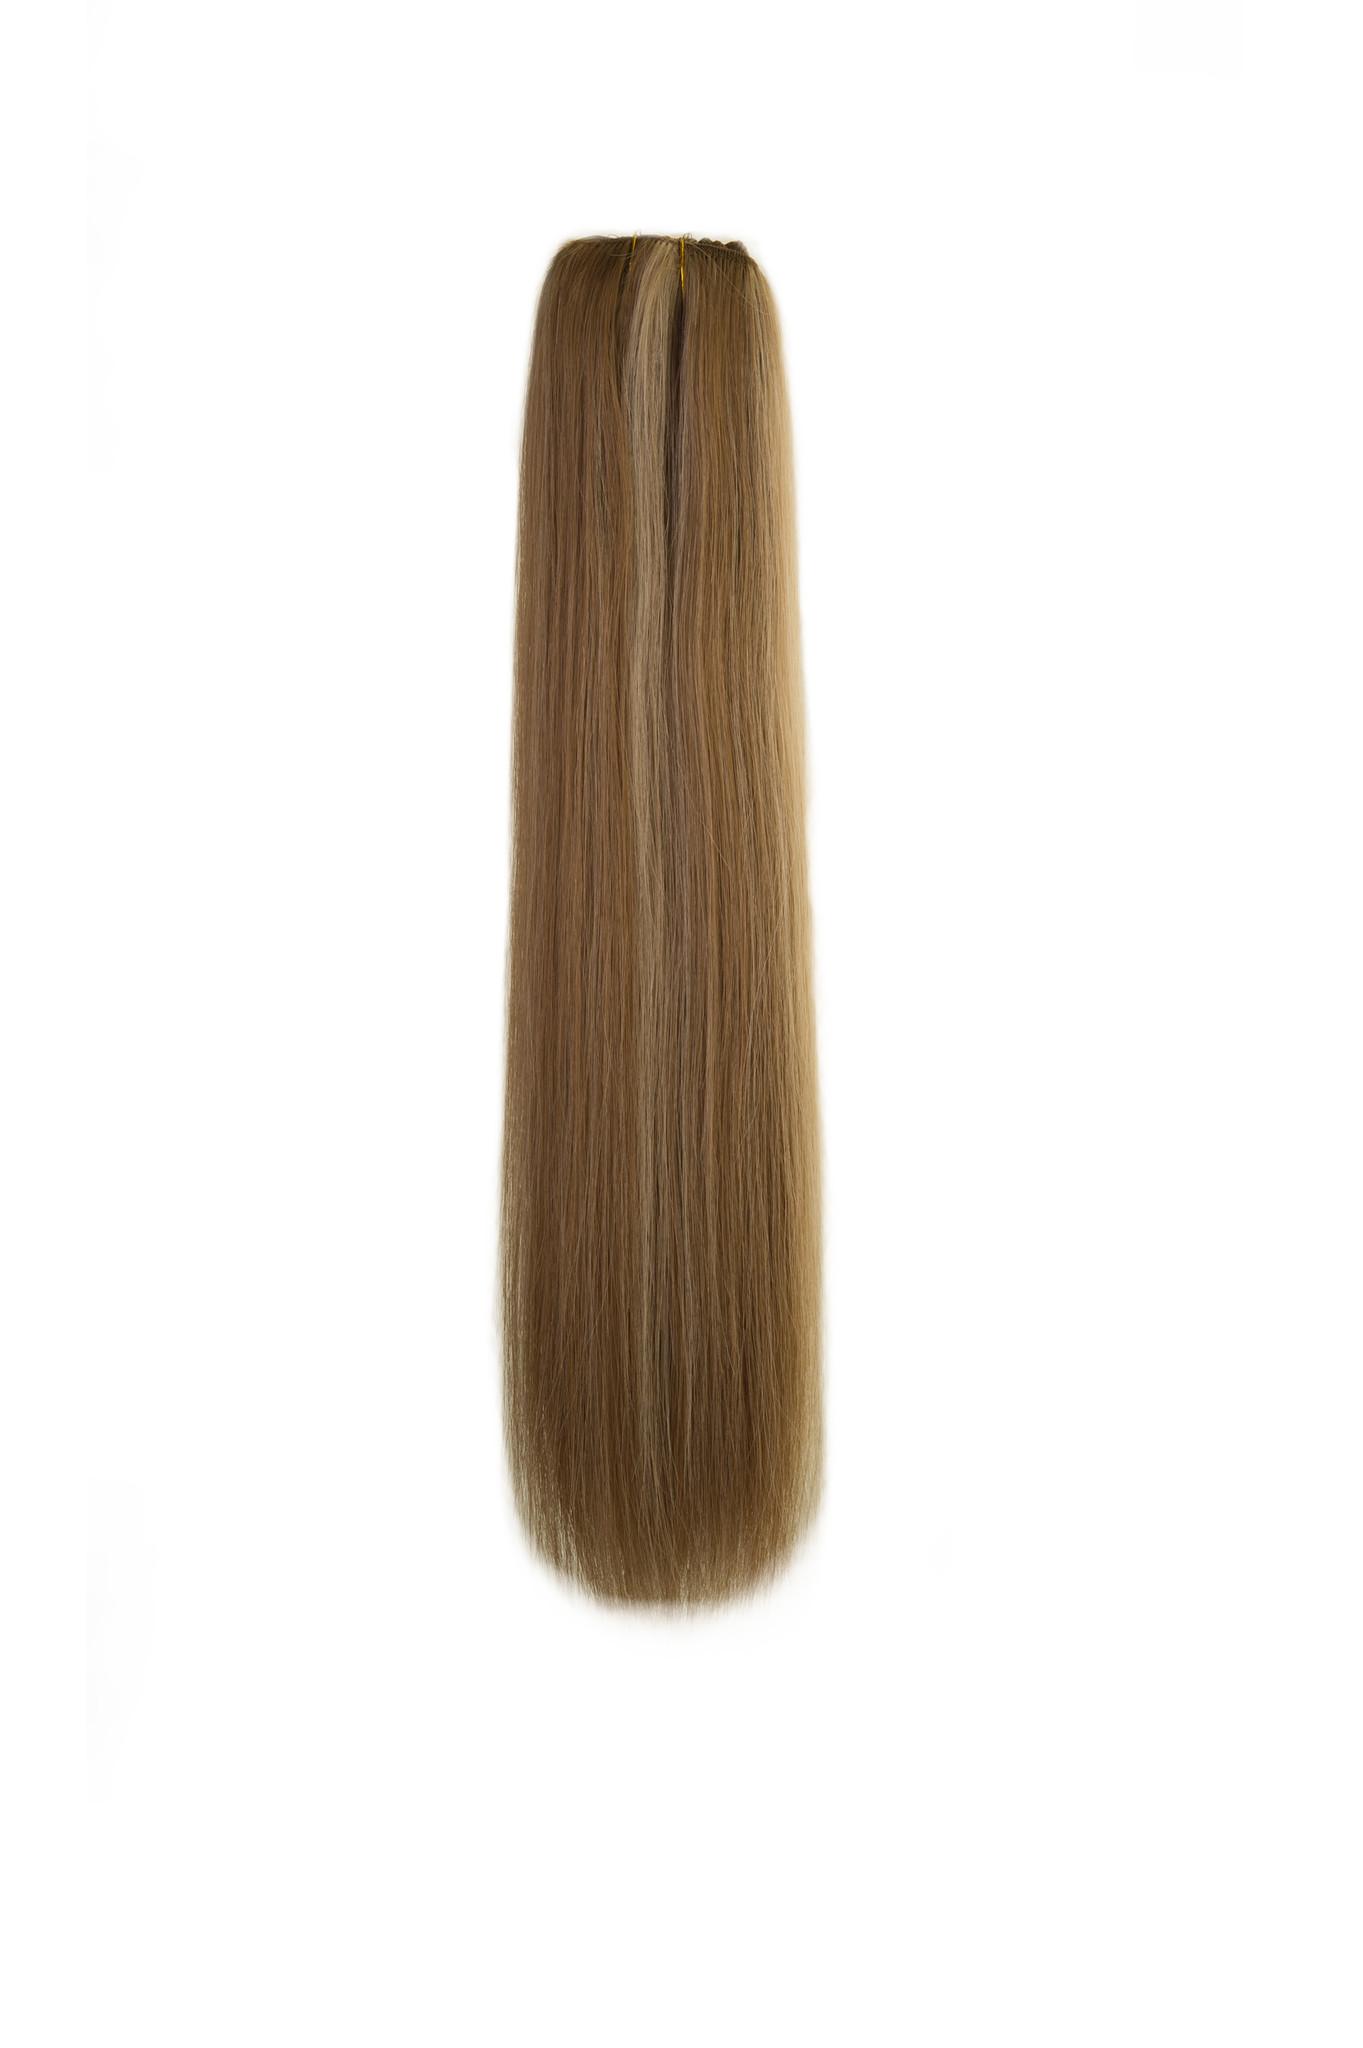 SilverFox Weave - #12/60 Ash Blonde/ White Blonde